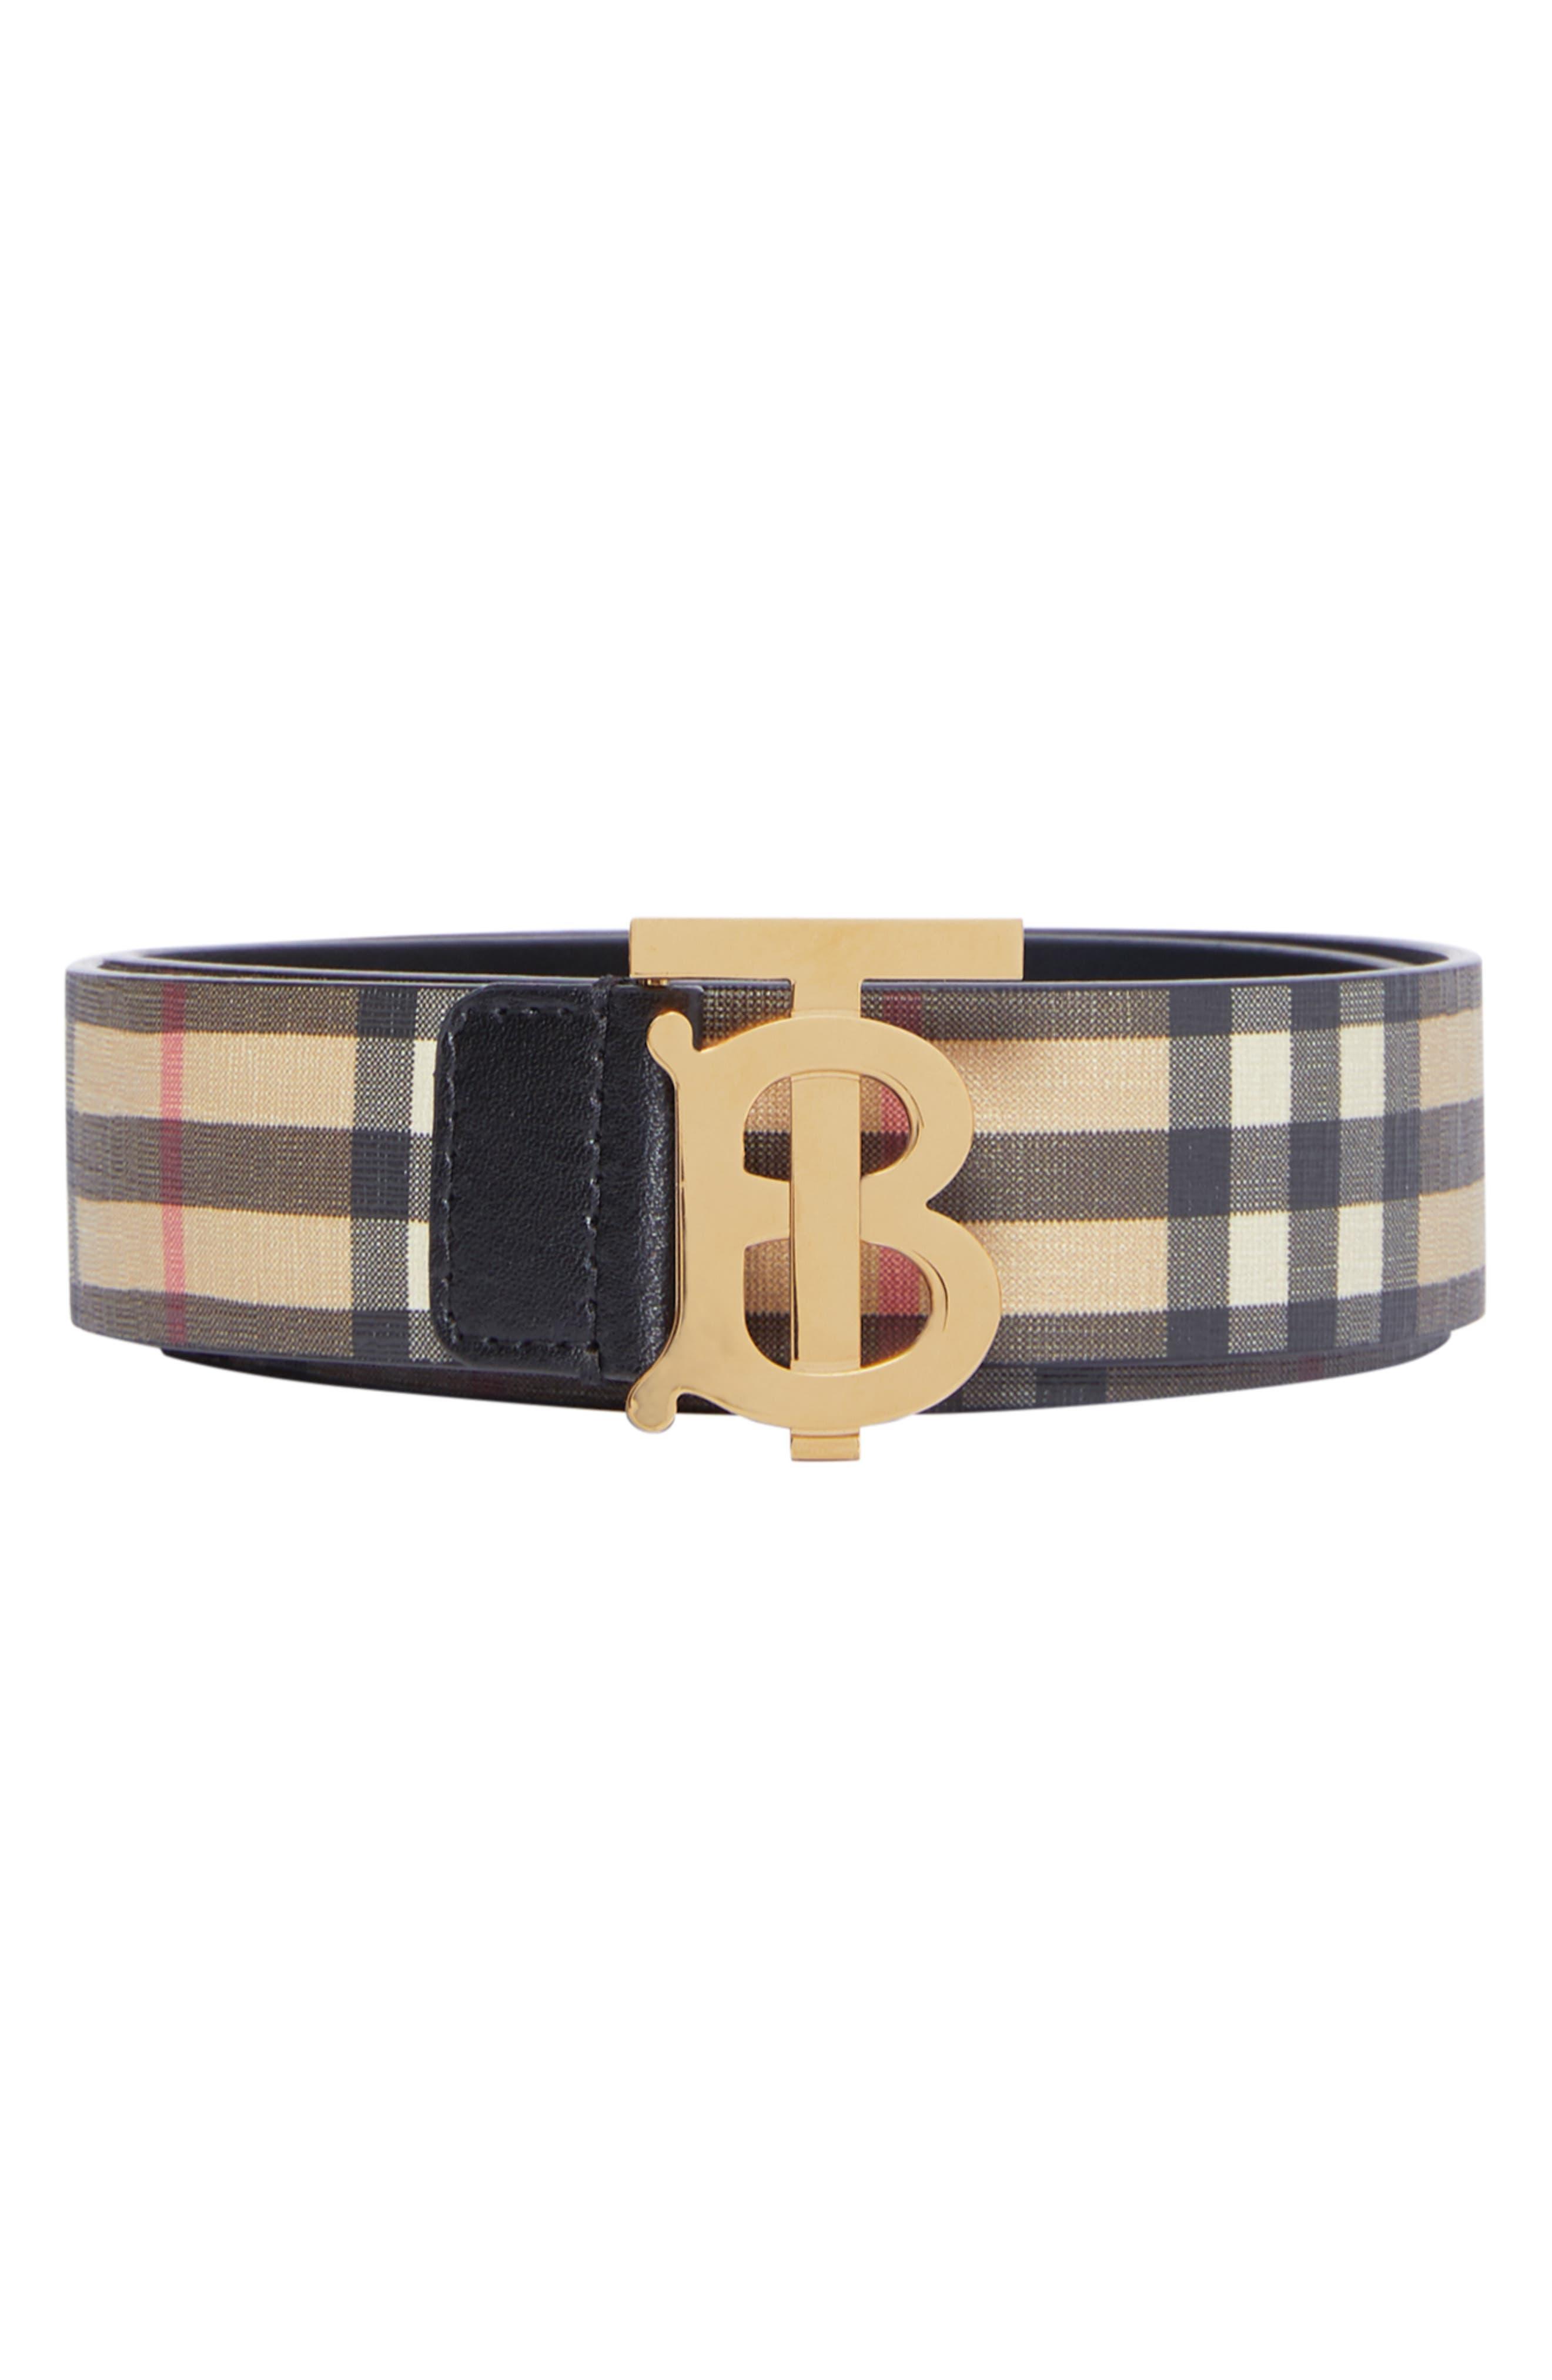 BURBERRY TB Monogram Vintage Check Canvas Belt